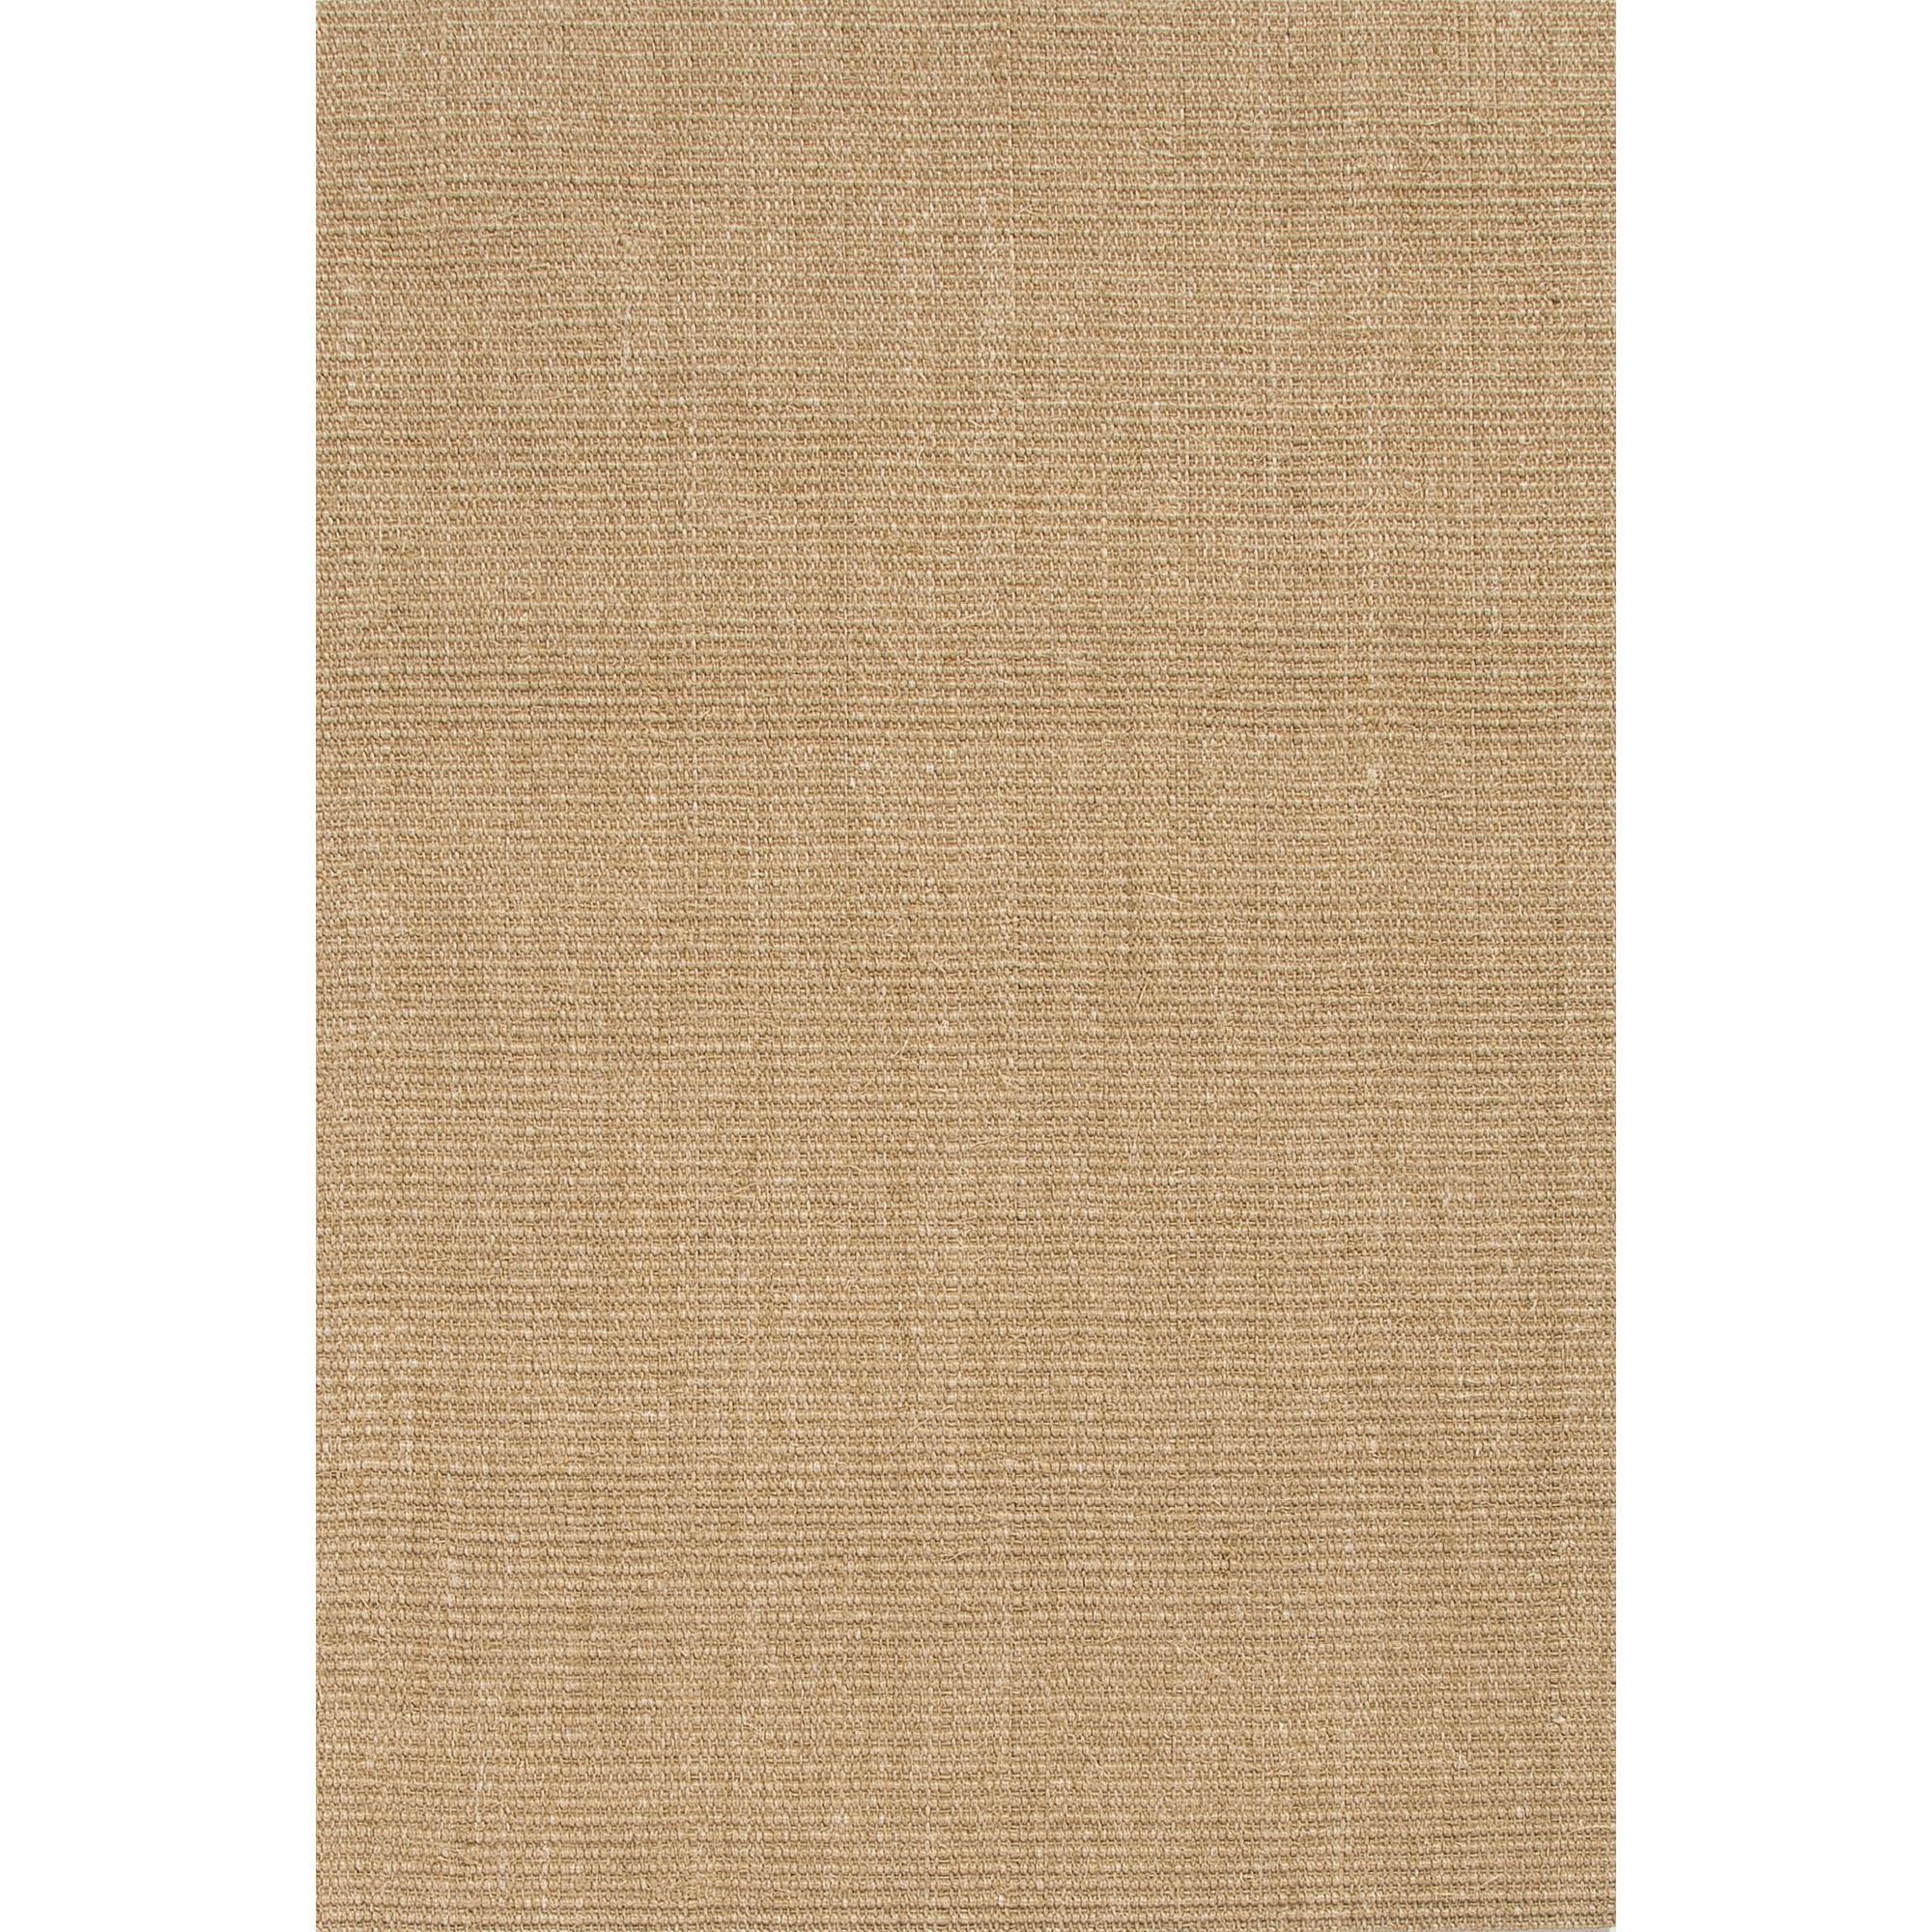 JAIPUR Rugs Naturals Sanibel 8 x 10 Rug - Item Number: RUG119160